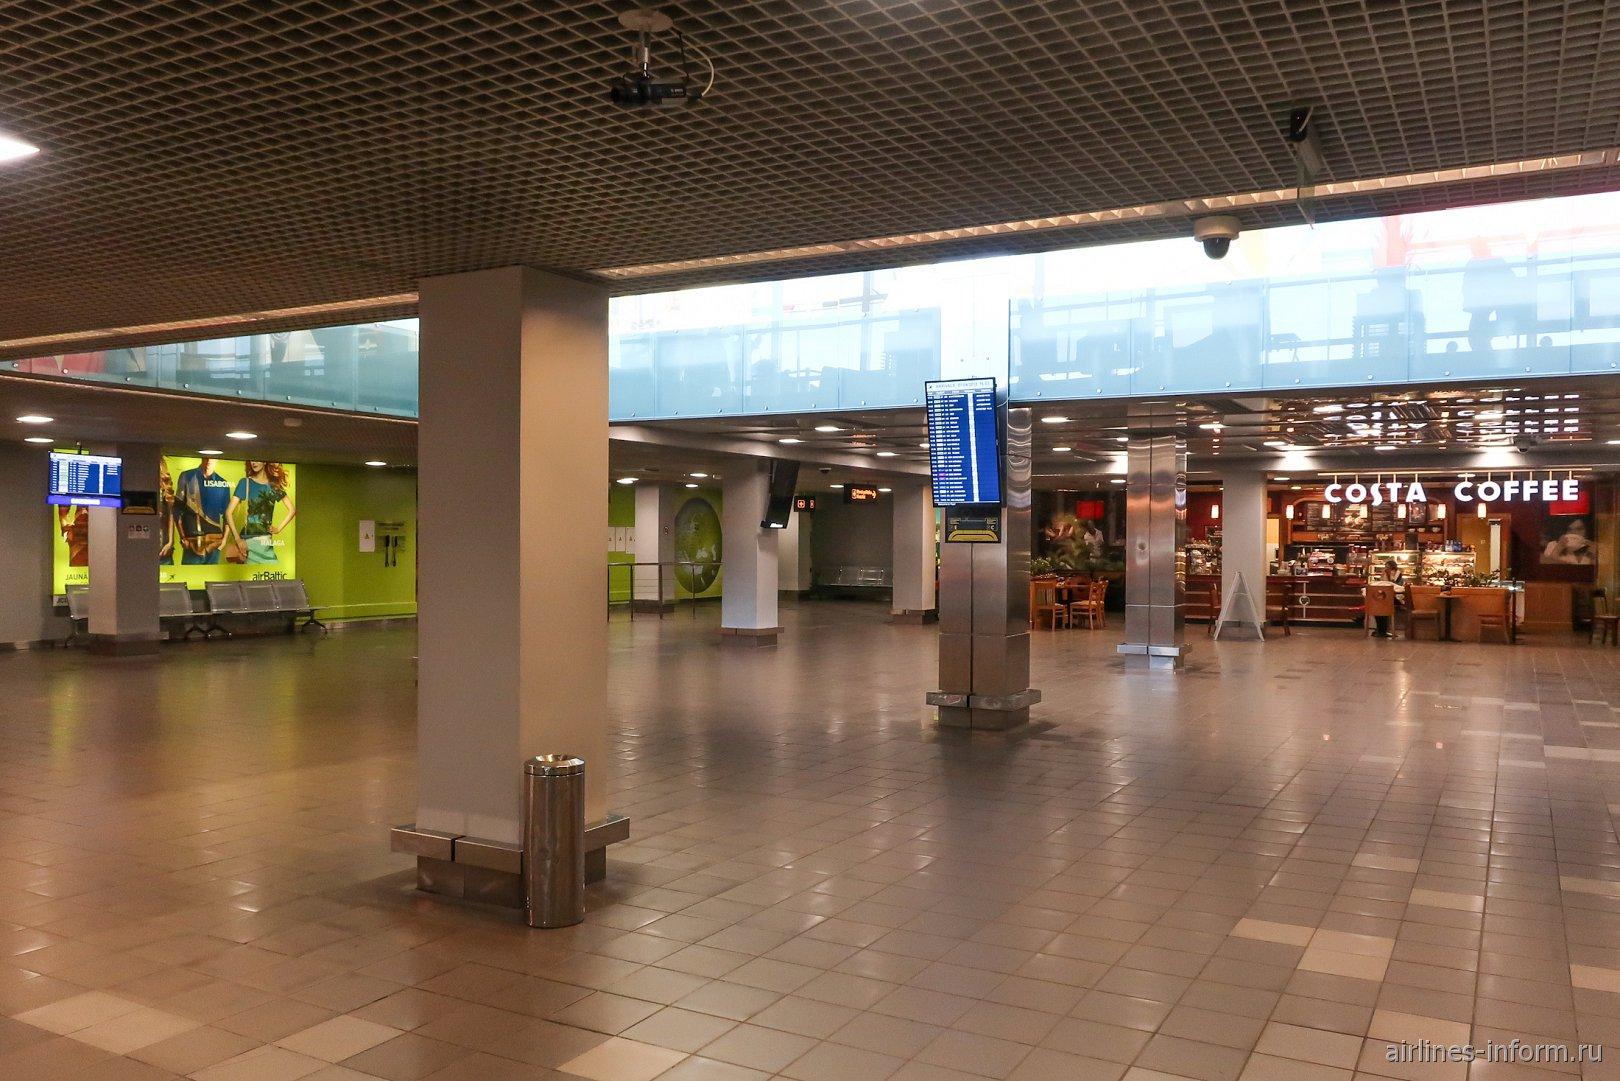 Зона прилета в аэропорту Рига